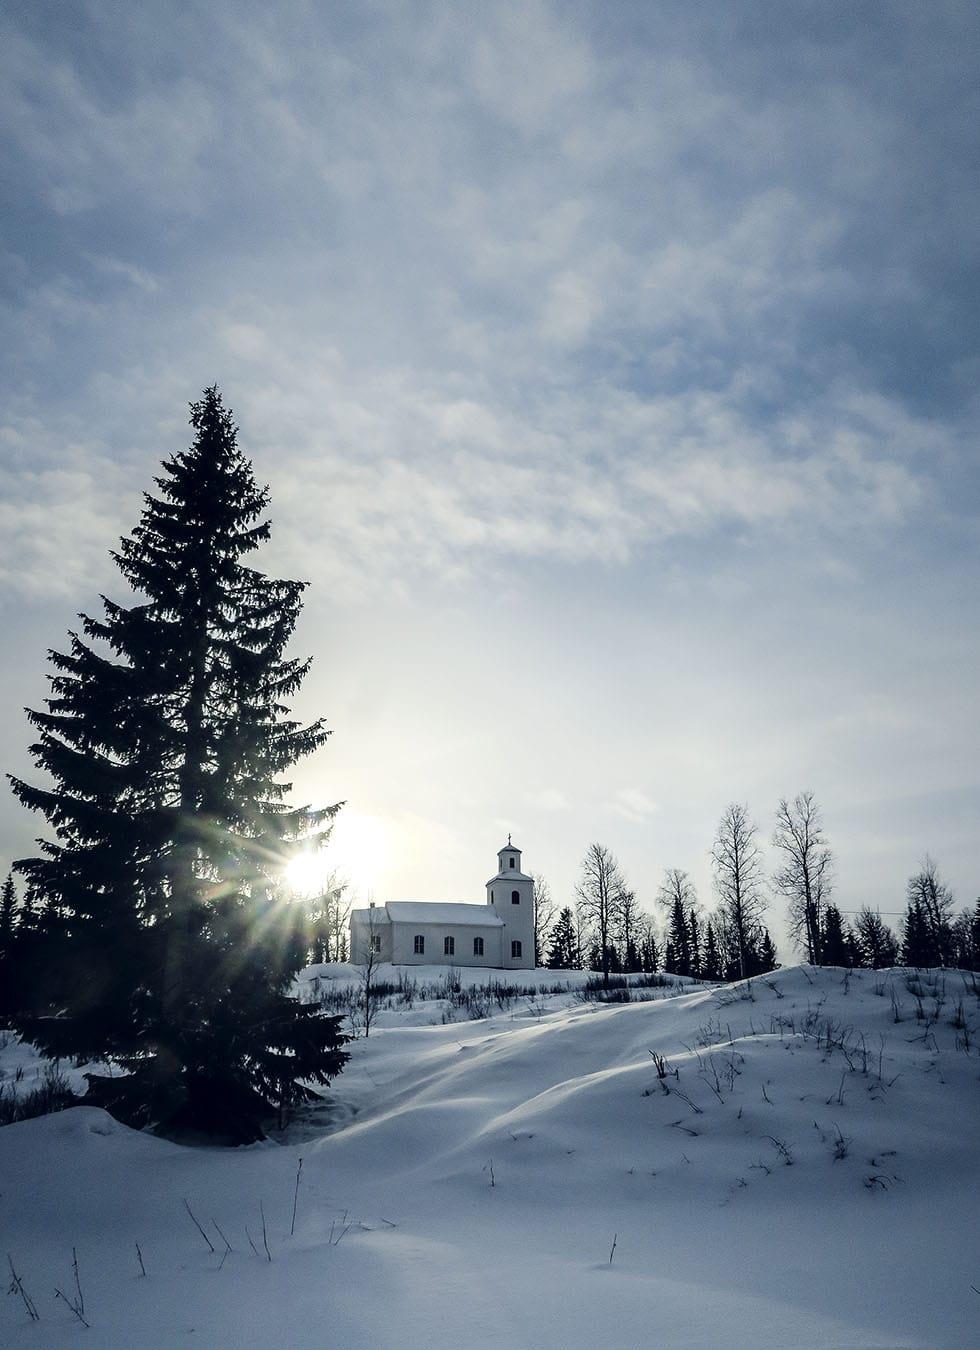 Väg 336 Kolåsens fjällhotell